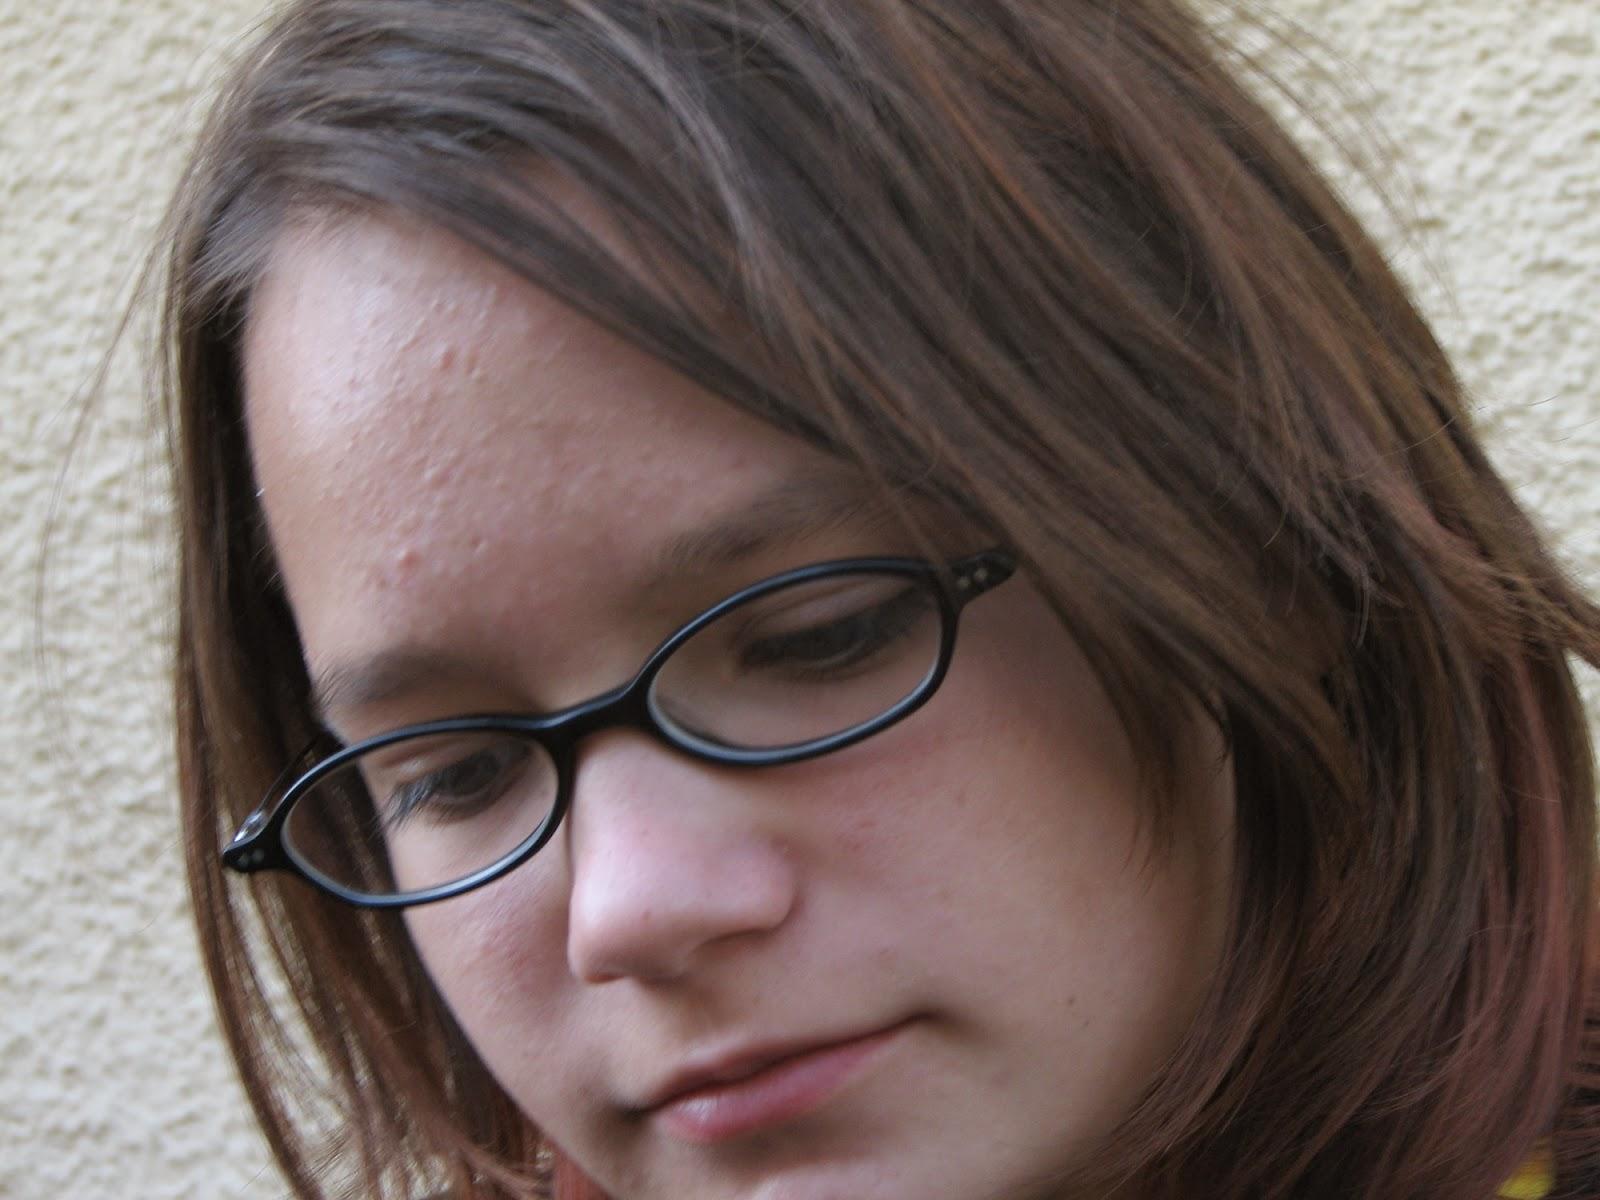 Bistrški dnevi, Ilirska Bistrica 2005 - picture%2B149.jpg